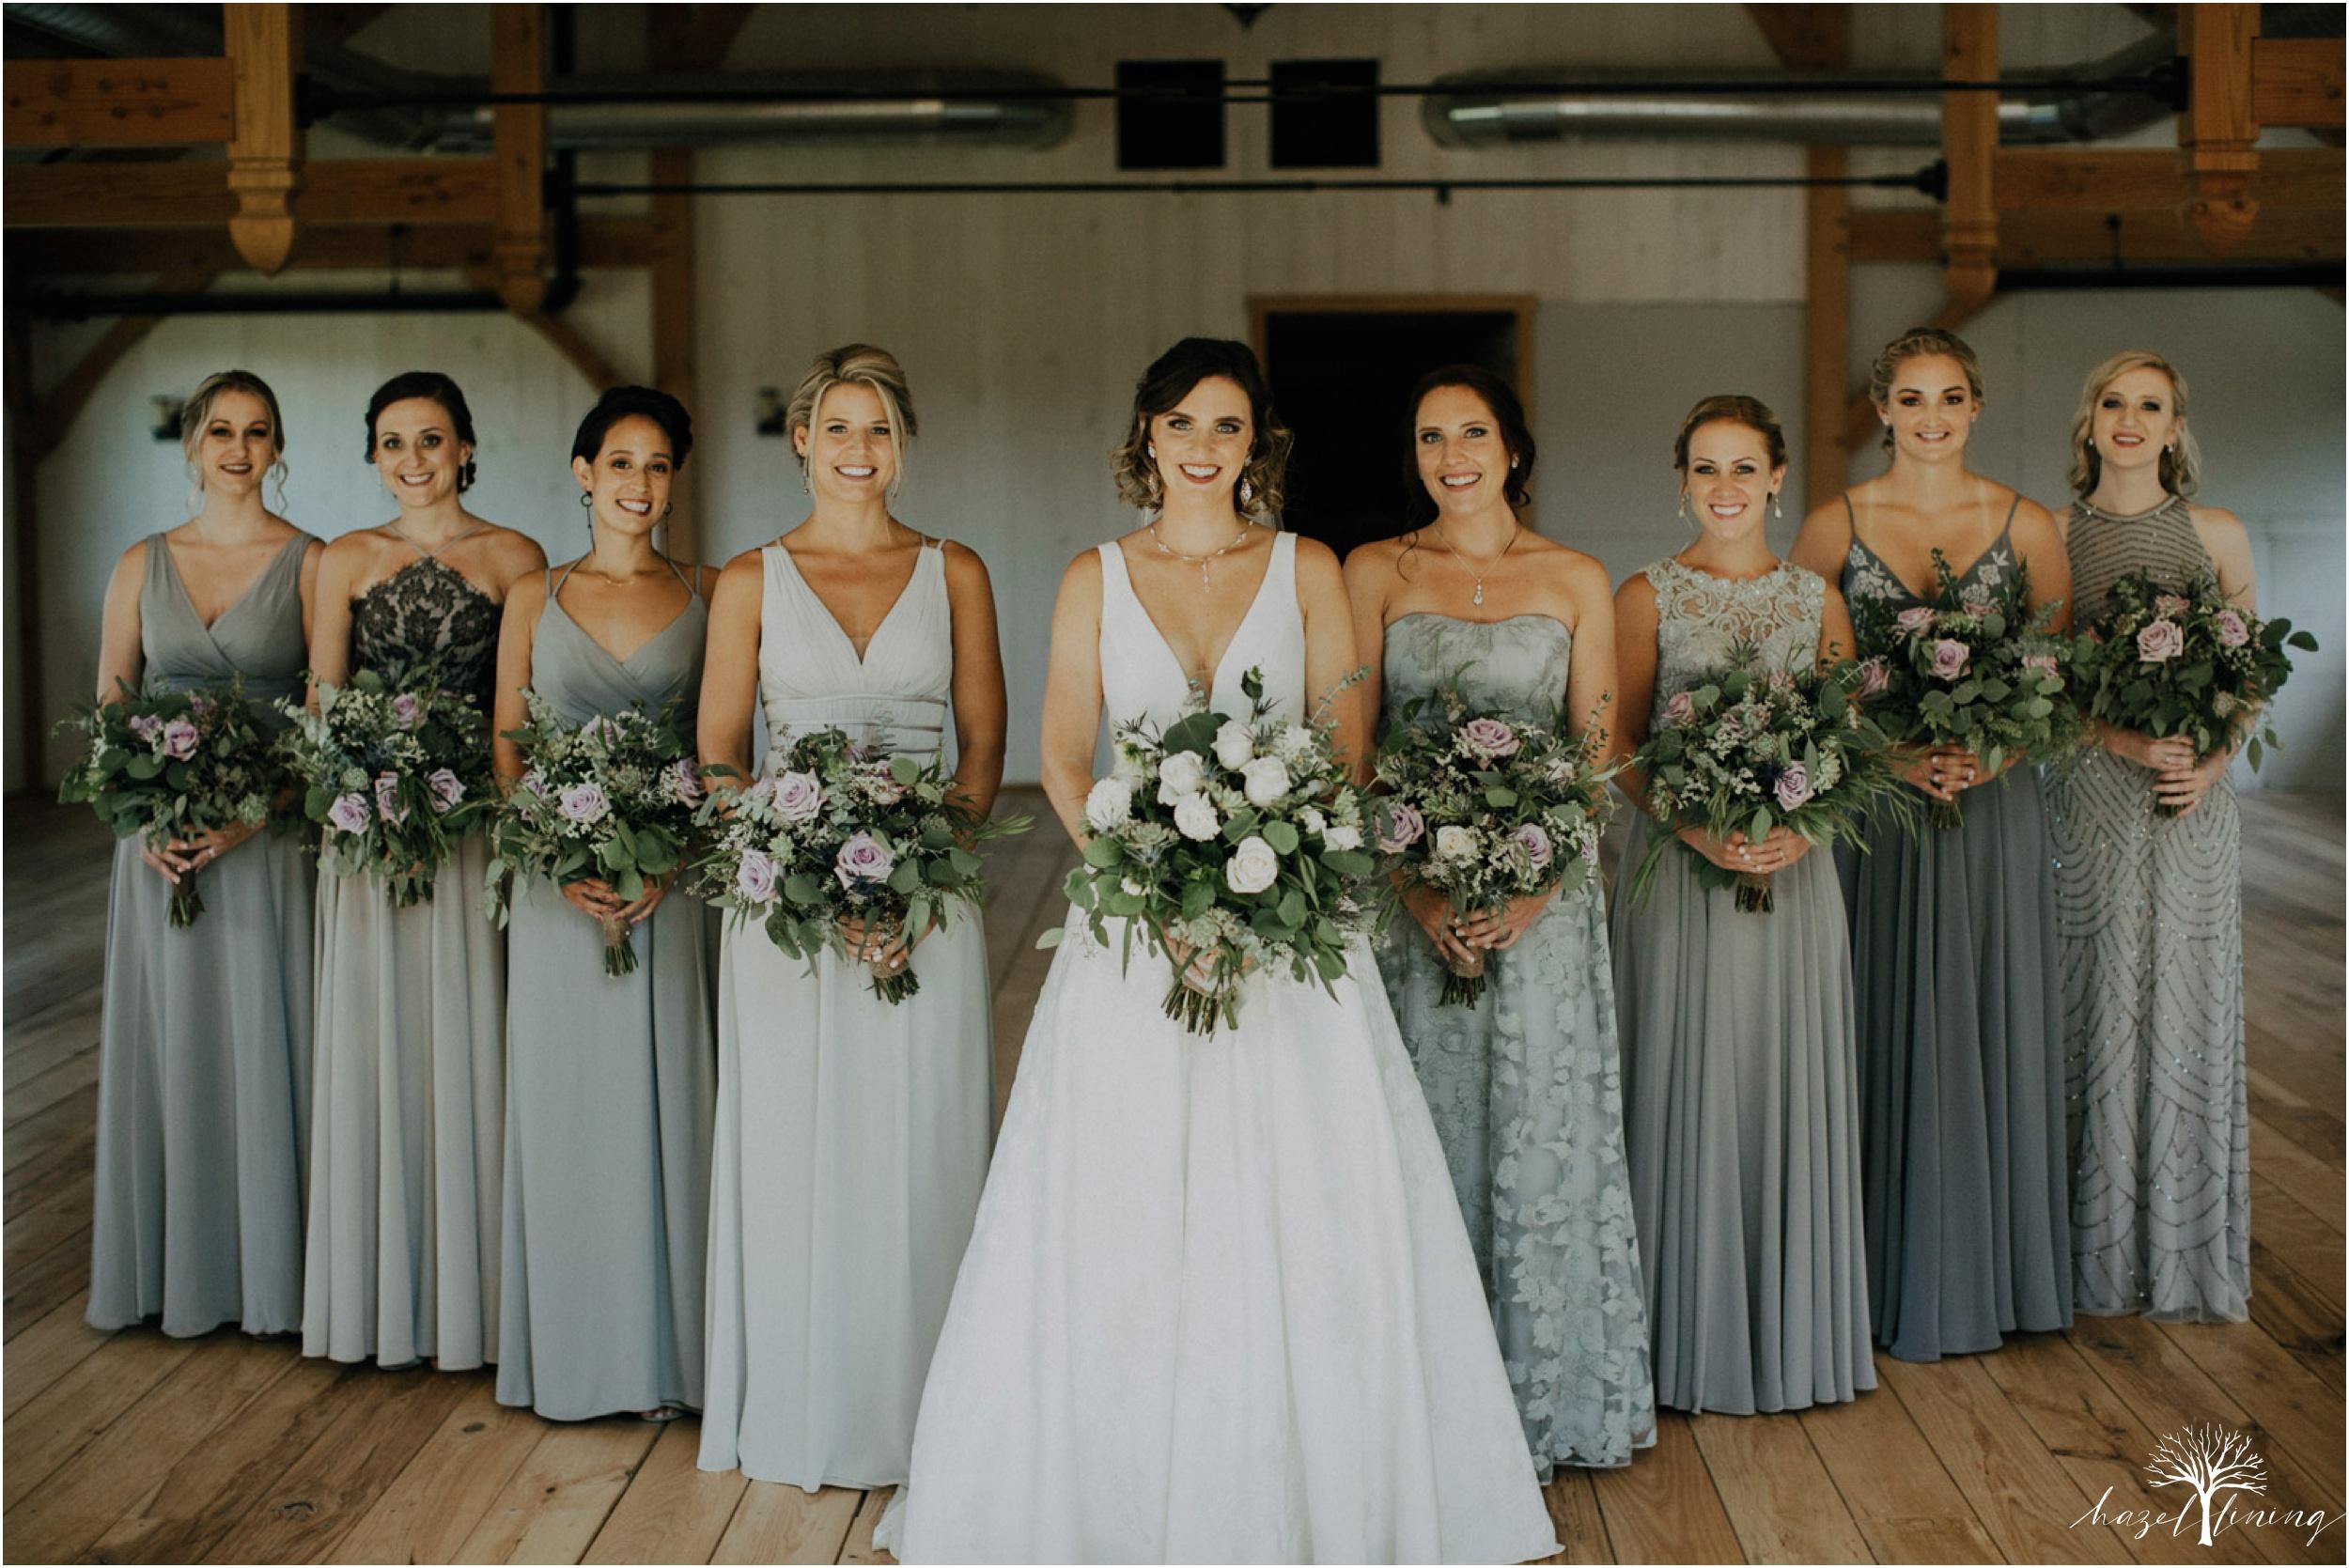 maureen-hepner-anthony-giordano-rose-bank-winery-newtow-pennsylvania-luxury-summer-wedding-hazel-lining-photography-destination-elopement-wedding-engagement-photography_0033.jpg